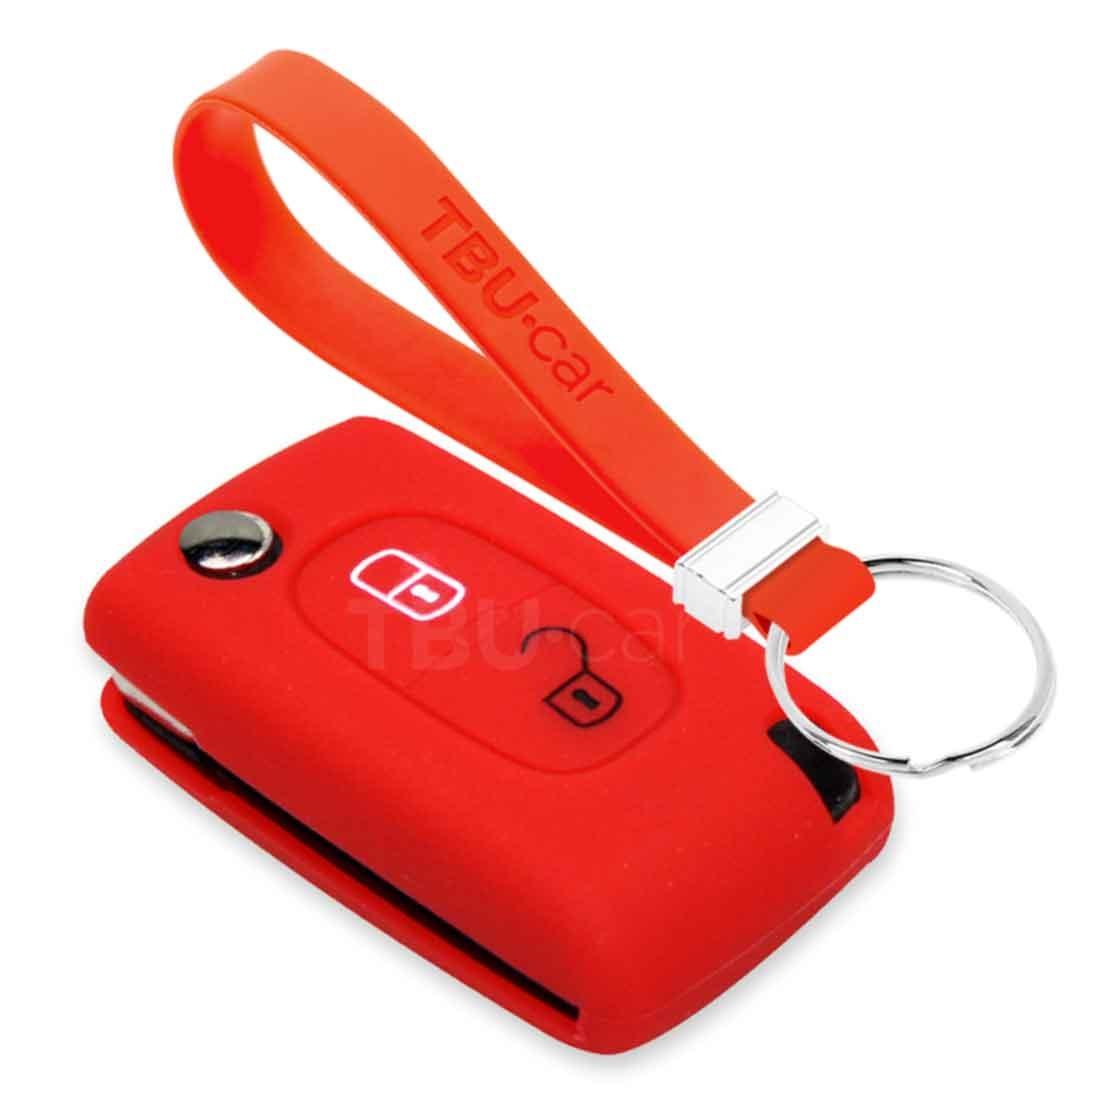 TBU car TBU car Autoschlüssel Hülle kompatibel mit Peugeot 2 Tasten - Schutzhülle aus Silikon - Auto Schlüsselhülle Cover in Rot